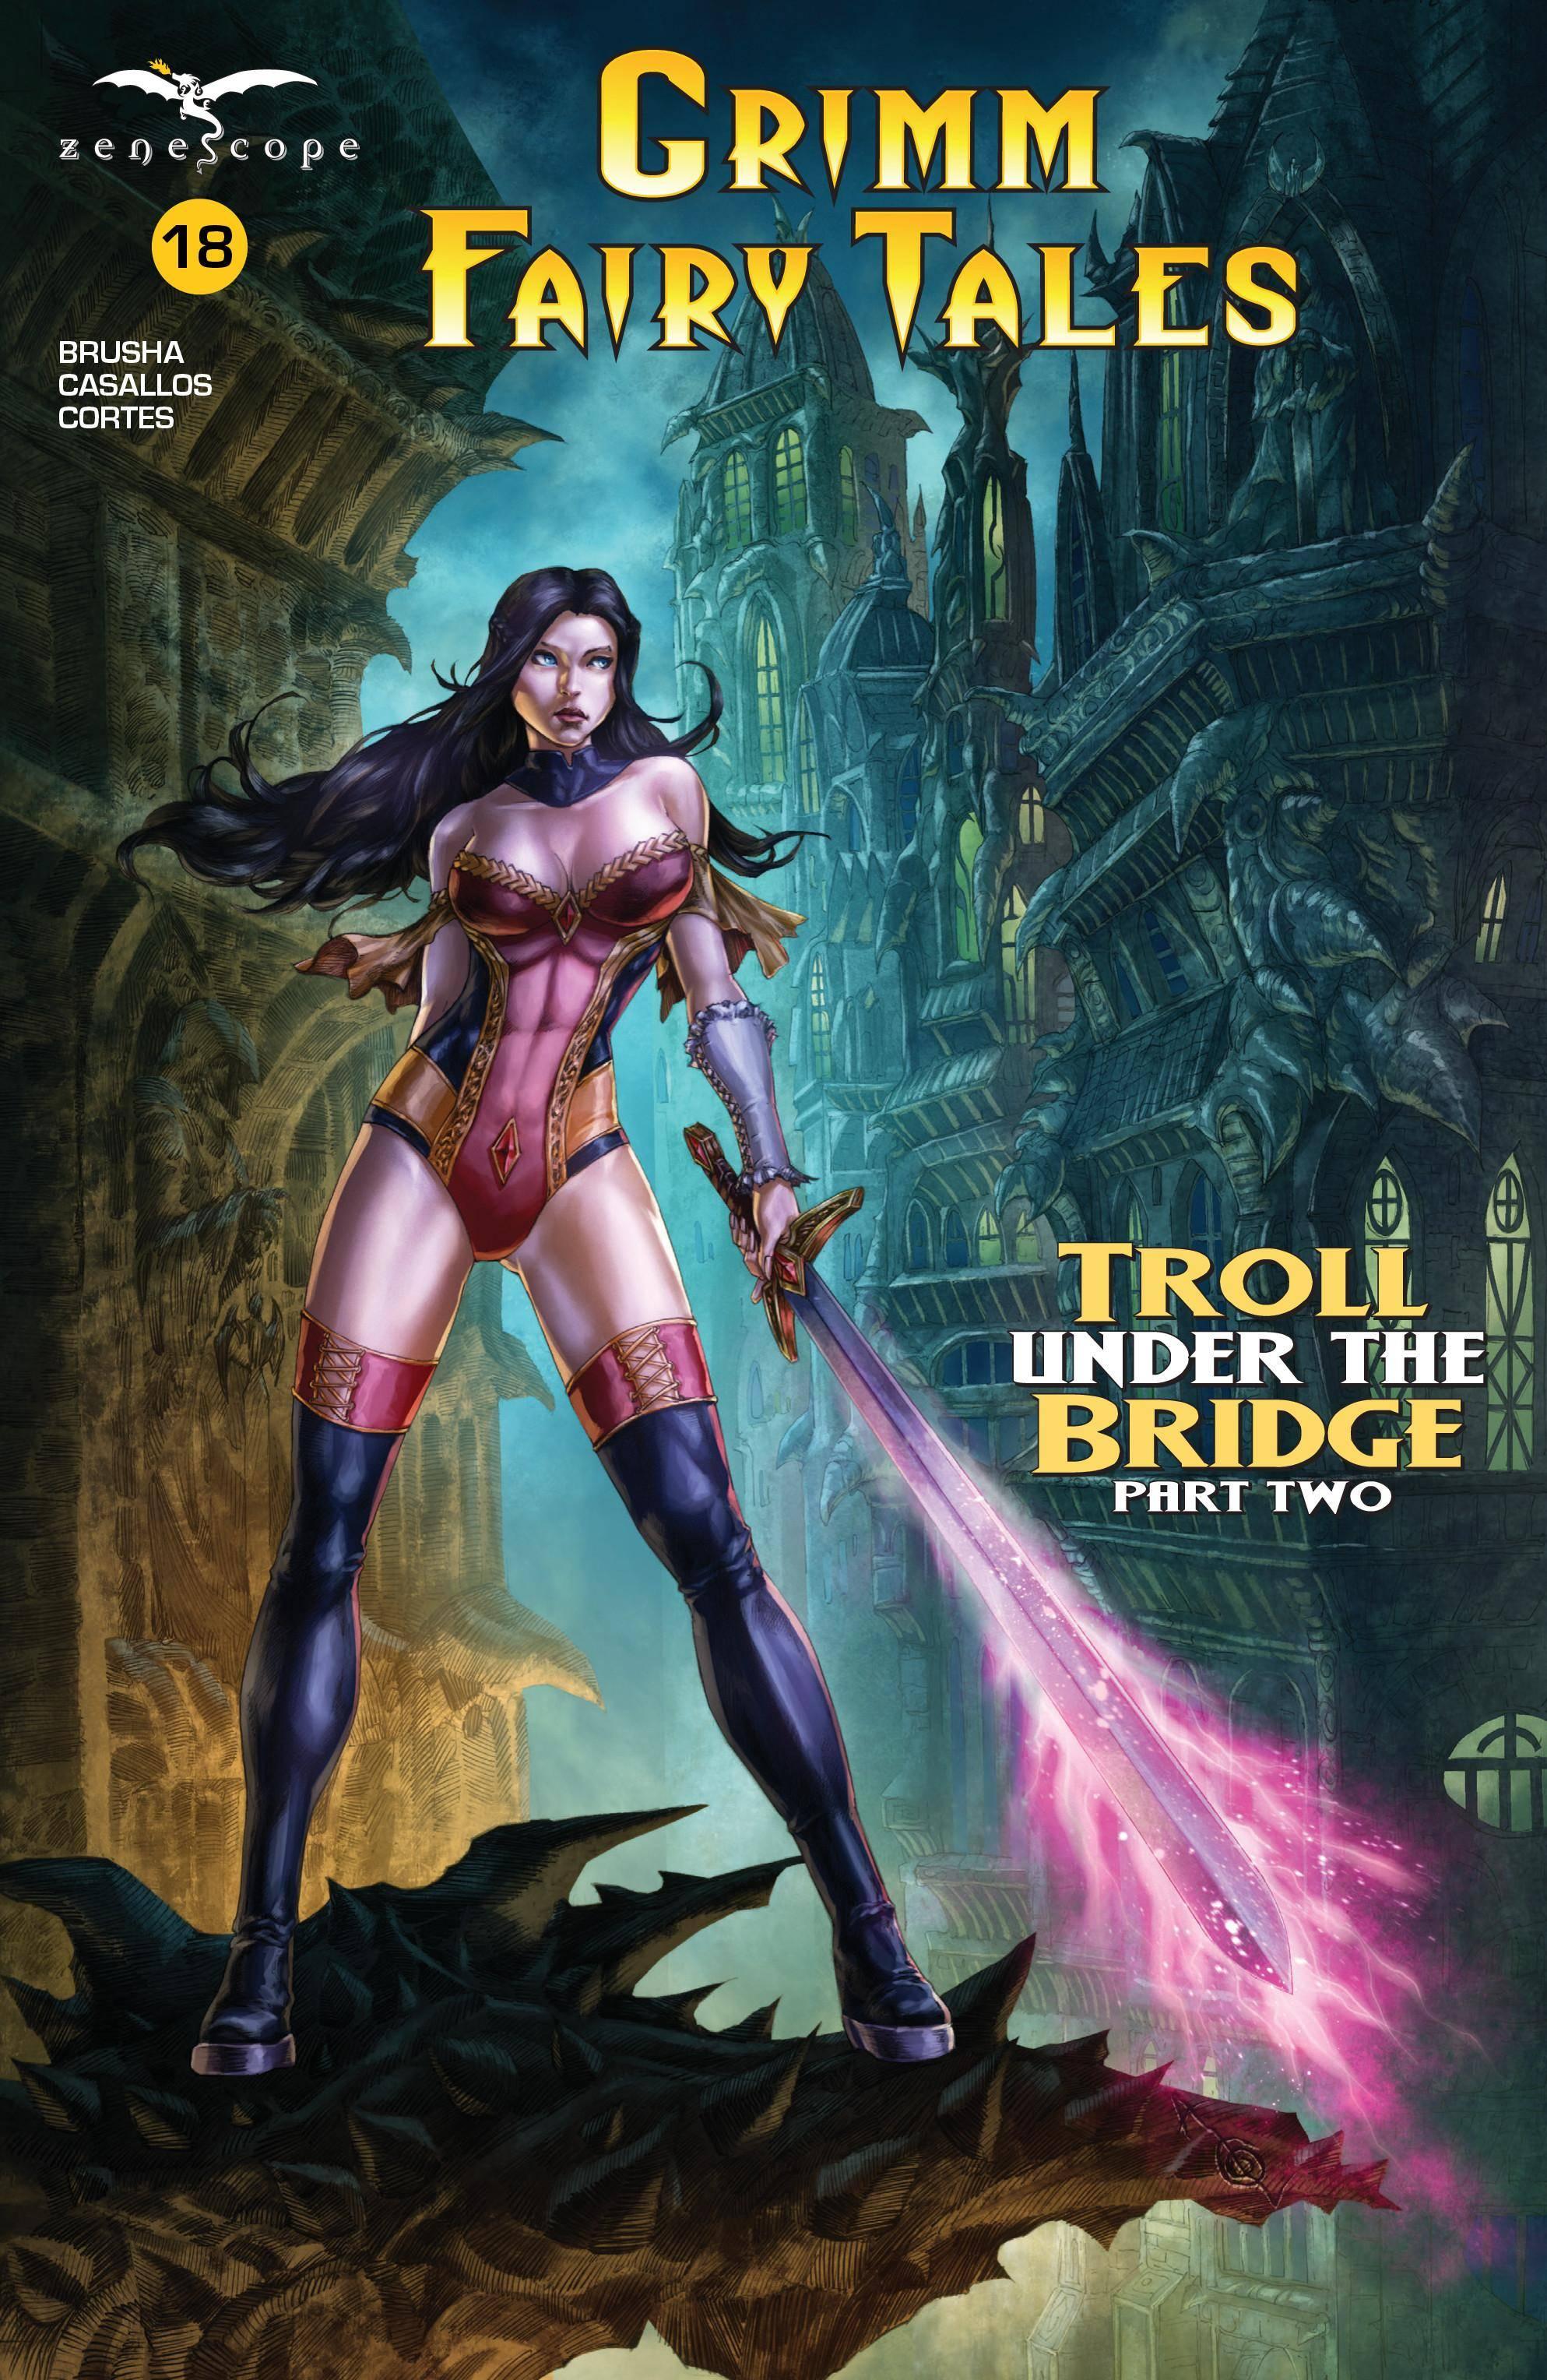 Grimm.Fairy.Tales.Vol.2.0182018DigitalTLK-EMPIRE-HD